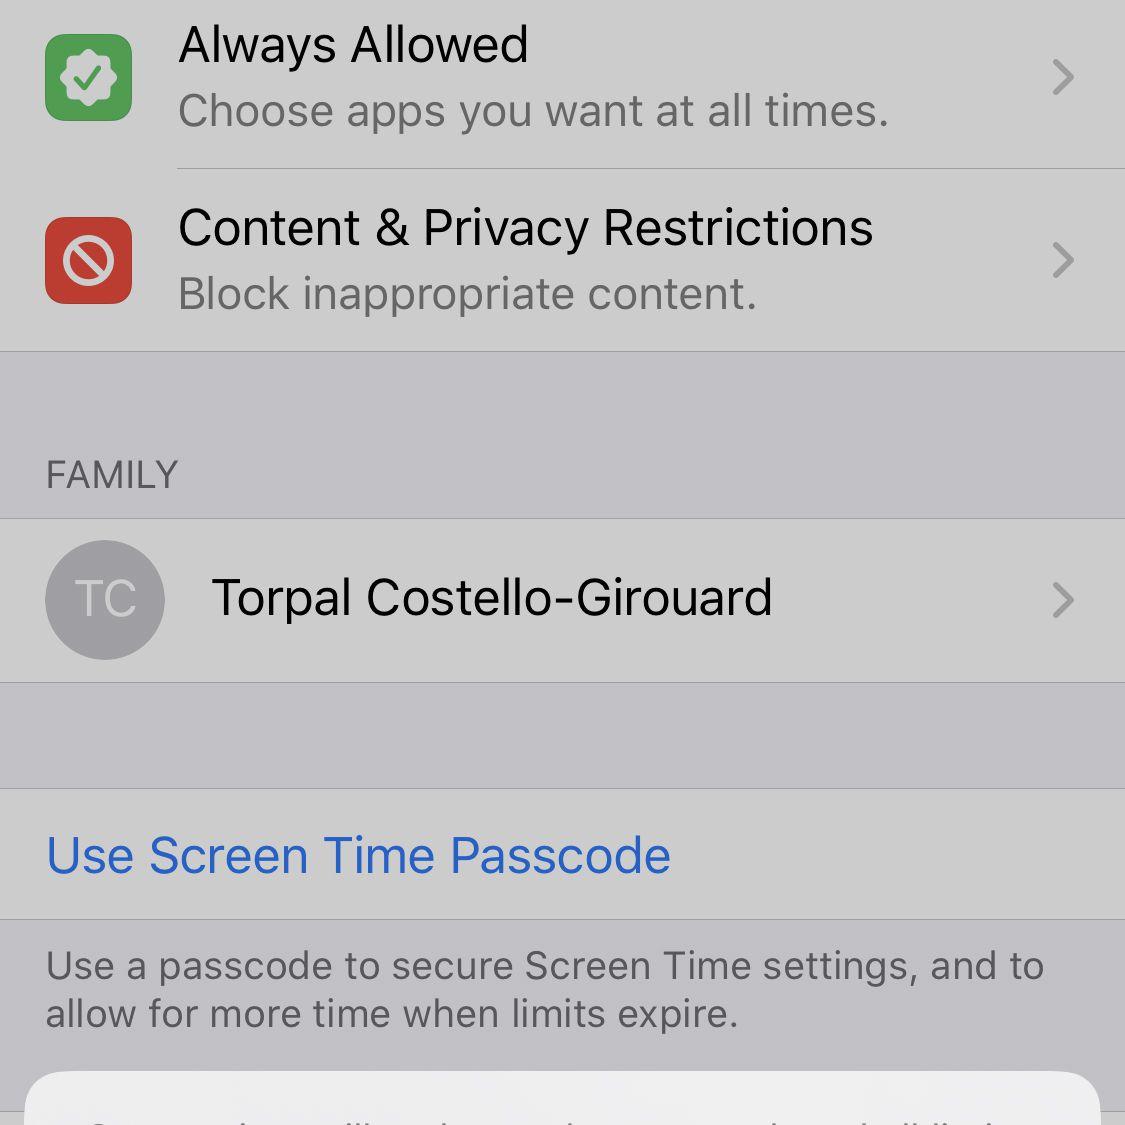 Screenshot of the menu confirming turning off Screen Time